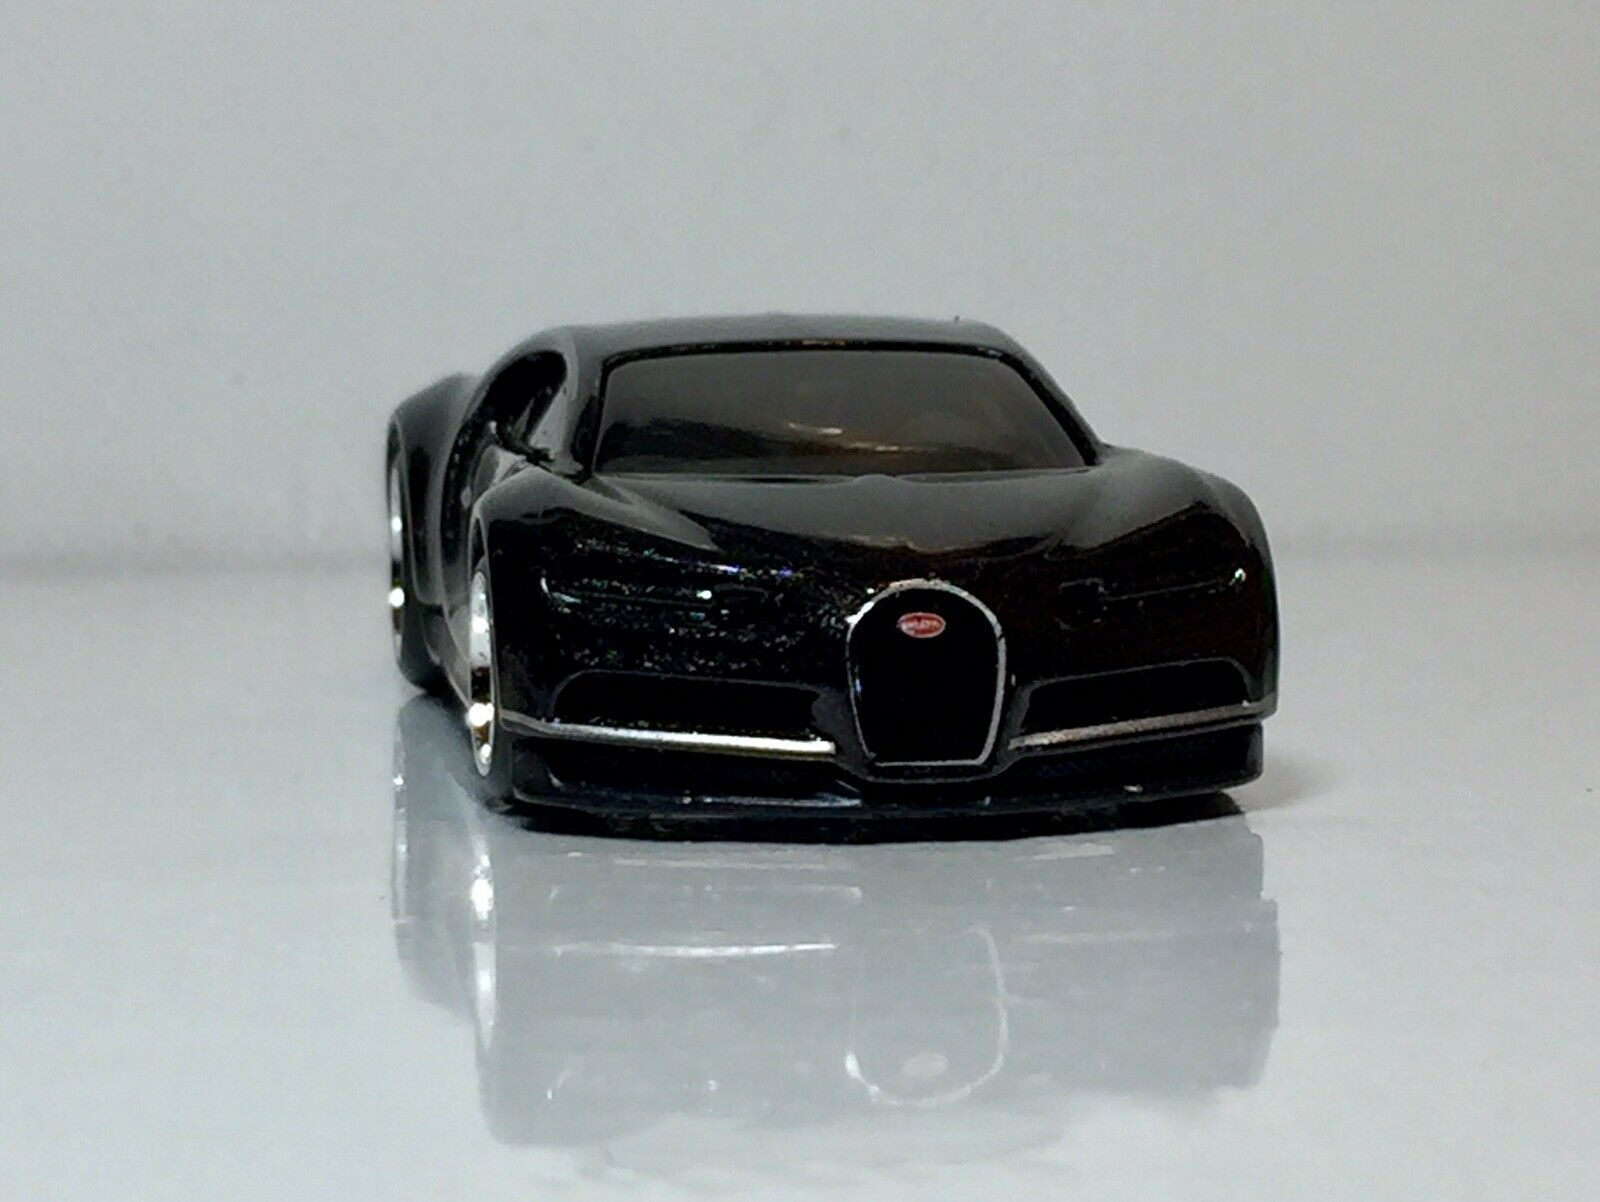 Hot Wheels 16 Bugatti Chiron Black Custom Loose Real Riders In 2020 Bugatti Chiron Black Bugatti Chiron Hot Wheels